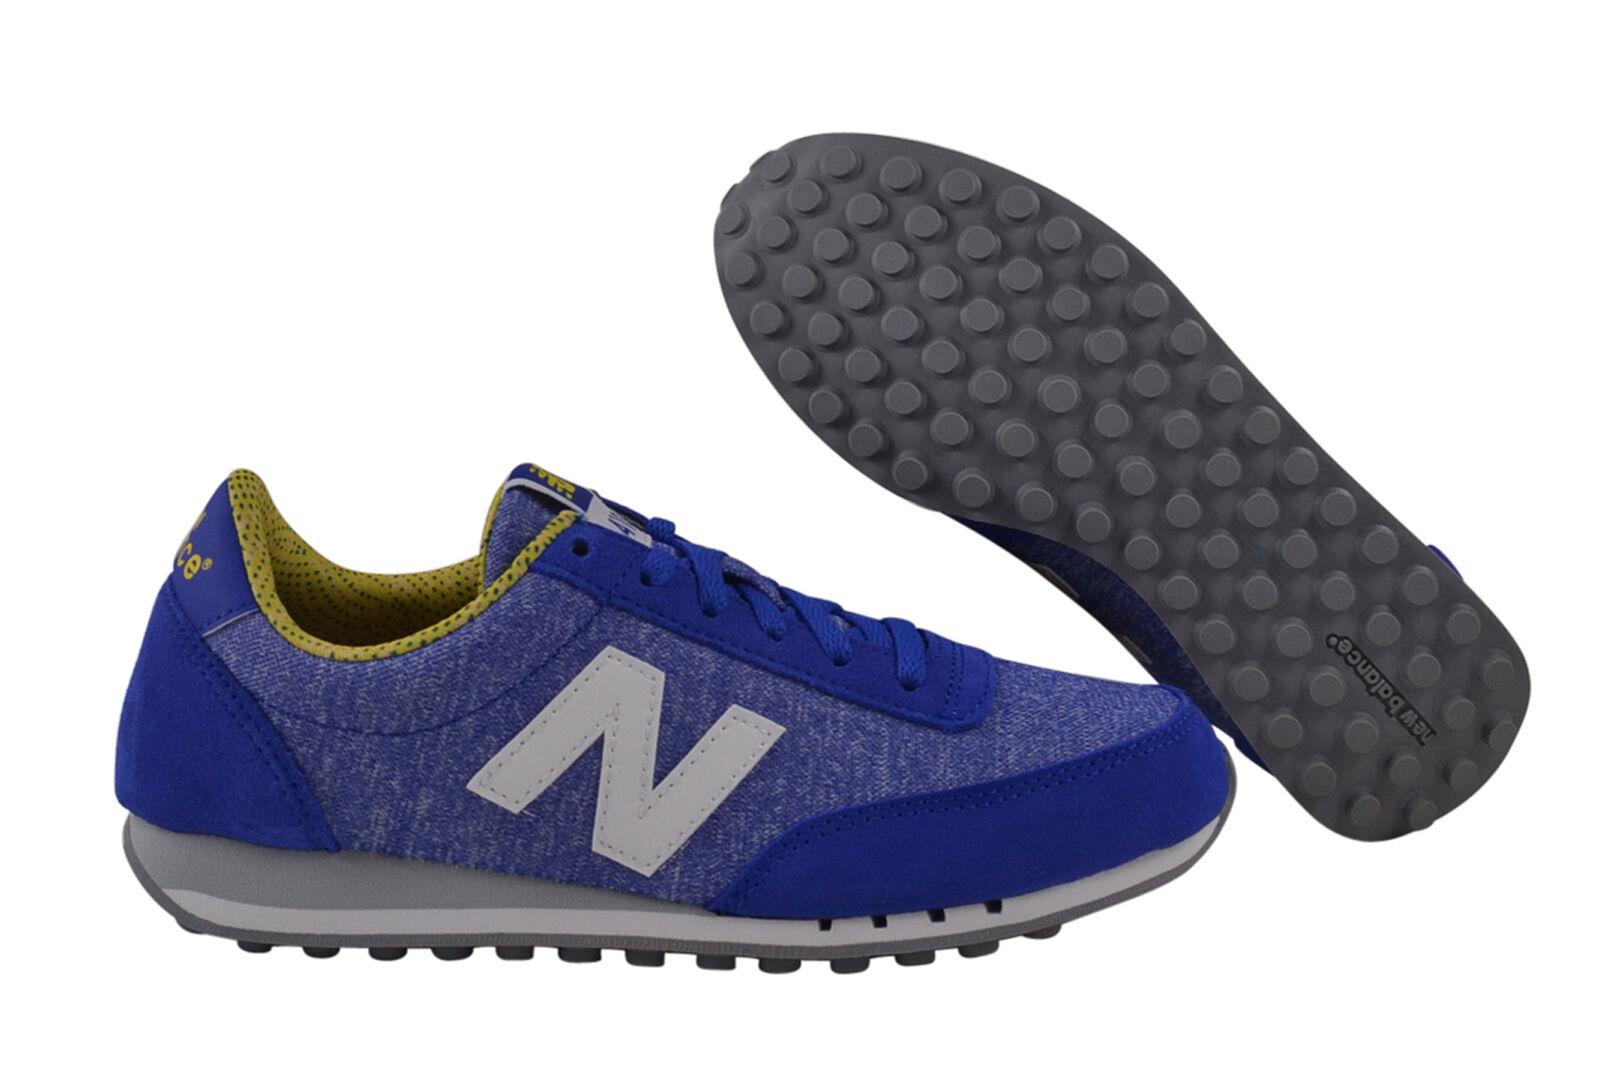 New Balance WL410 OPC Blau Schuhe/Turnschuhe blau